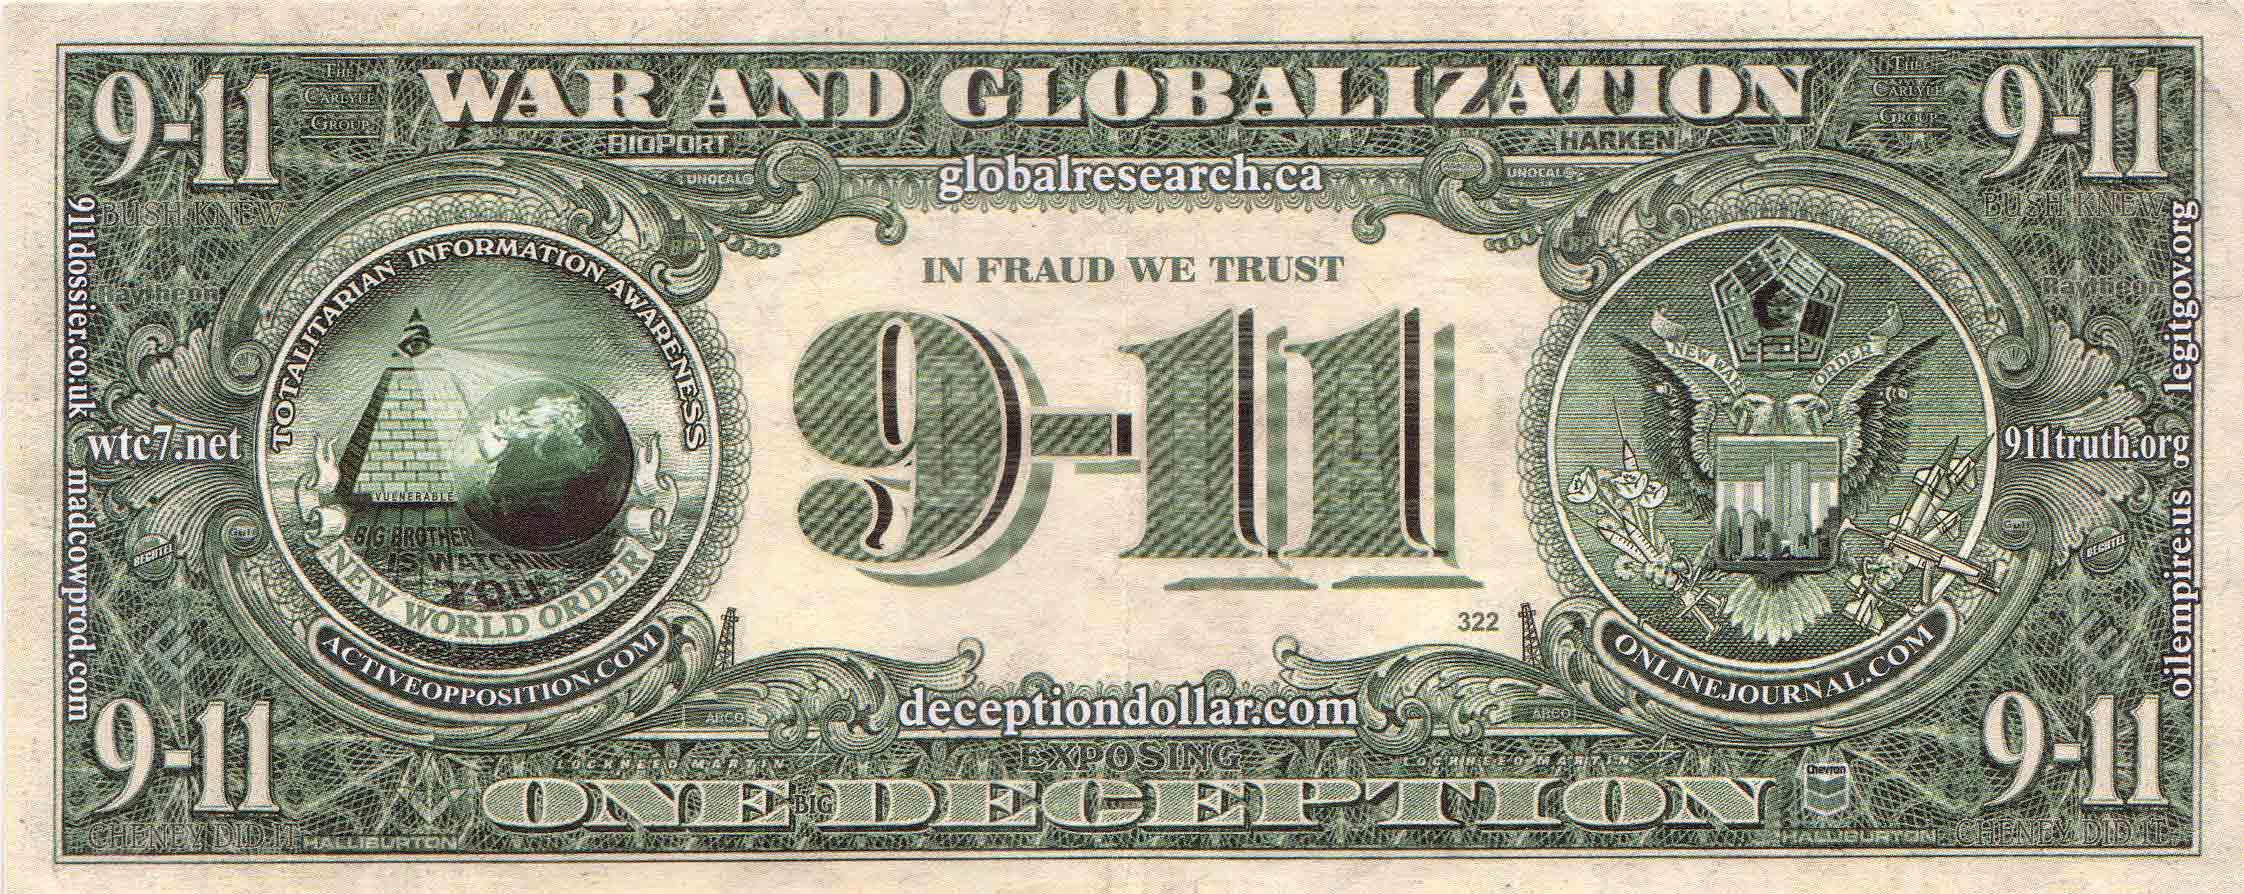 9-11 Conspiracy Dollar | MyConfinedSpace